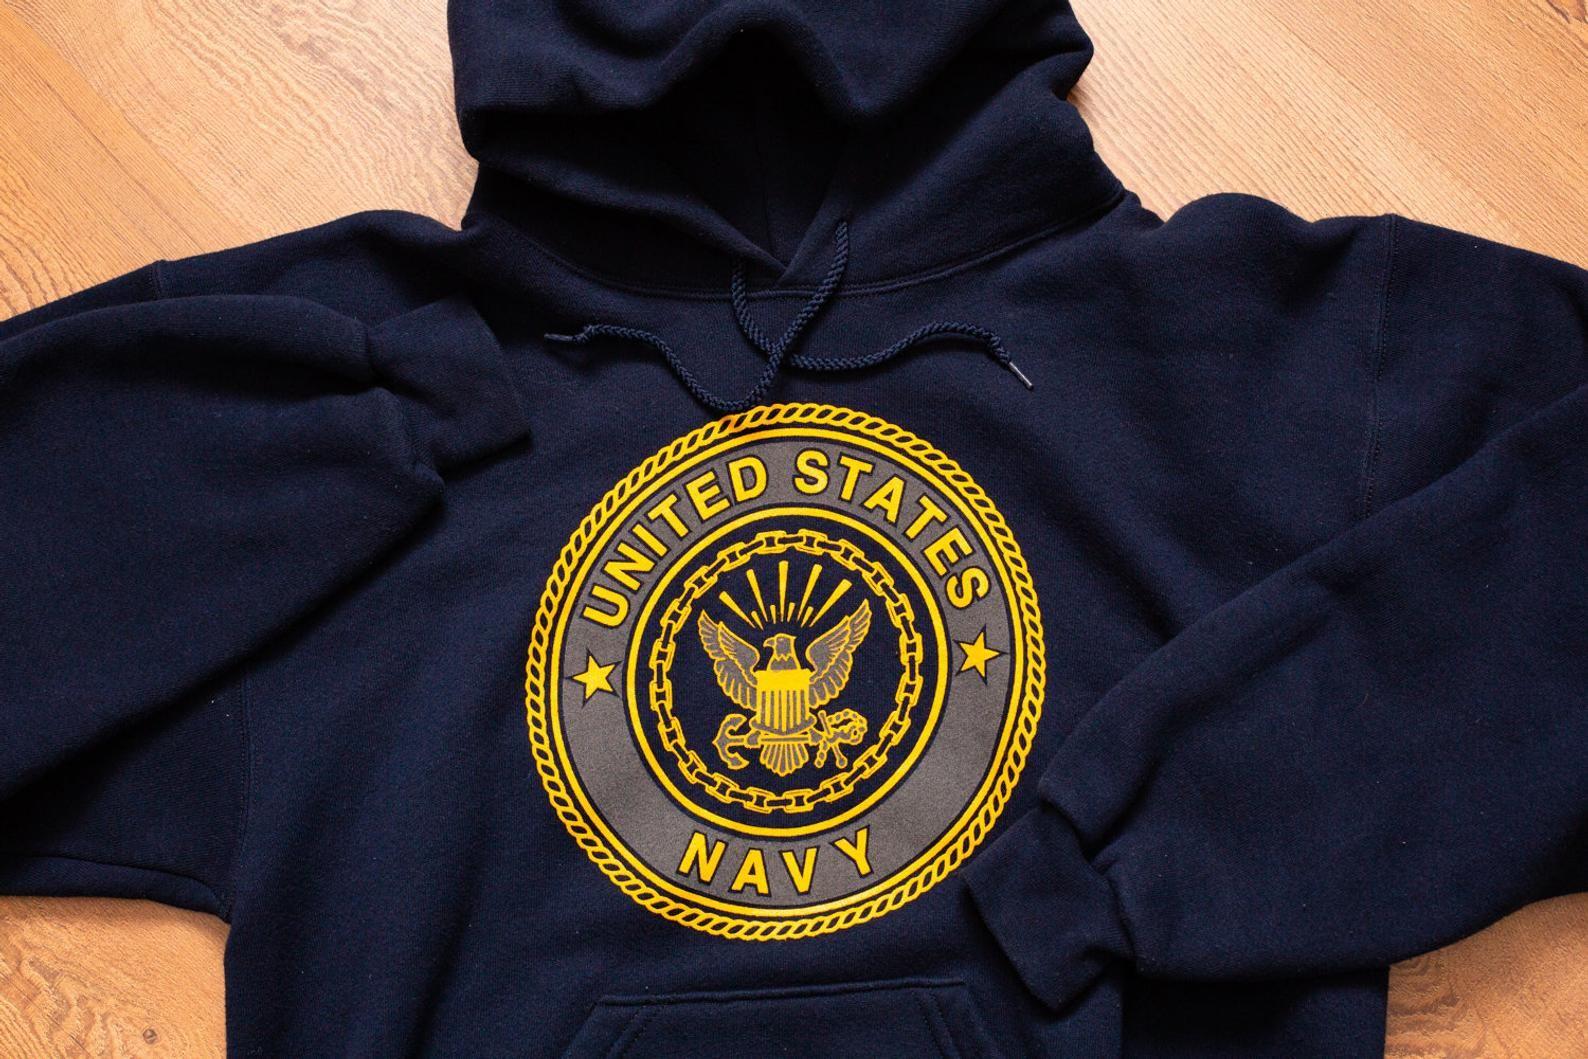 90s United States Navy Hoodie Sweatshirt S M Vintage 1990s Etsy Navy Hoodie Sweatshirts Sweatshirts Hoodie [ 1059 x 1588 Pixel ]